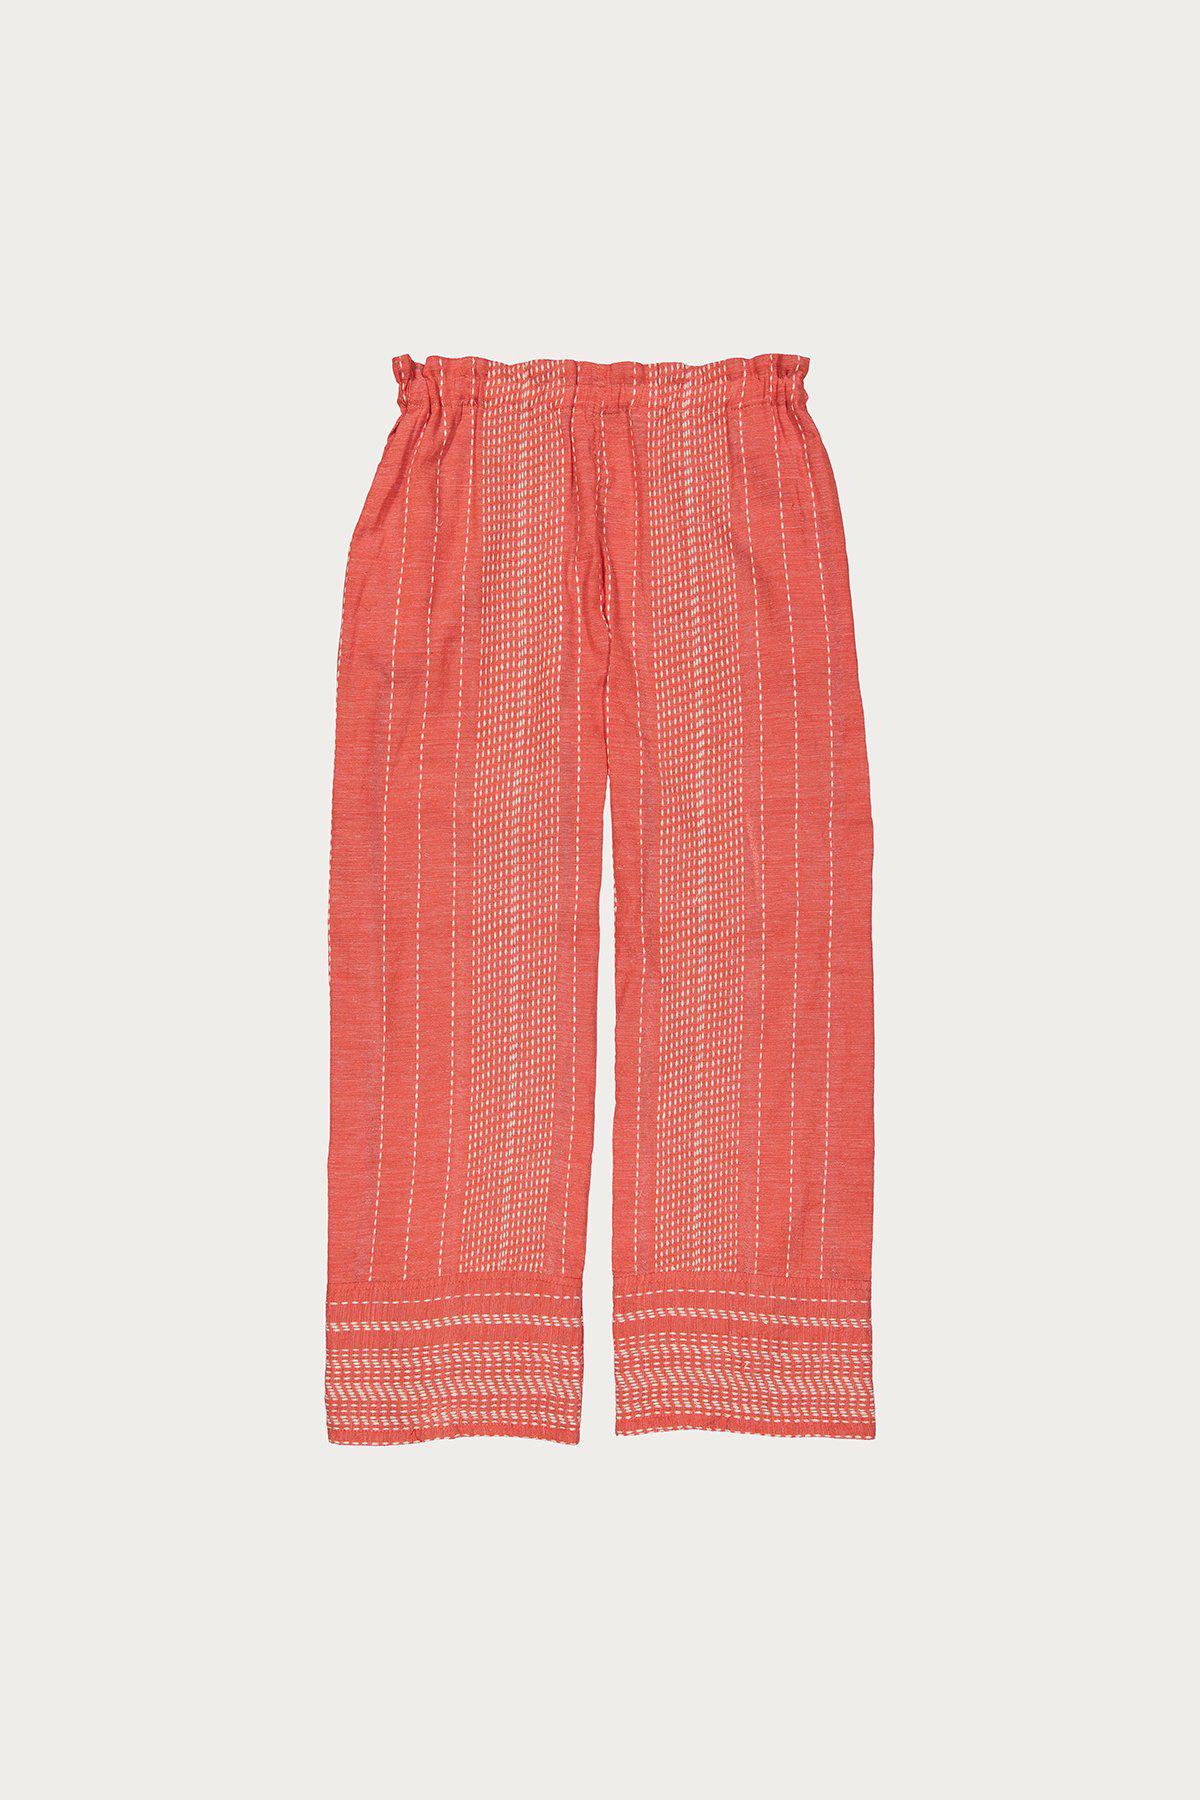 Footlocker Finishline For Sale Saba Cropped Embroidered Cotton-gauze Wide-leg Pants - Coral Lemlem Lowest Price Sale Online Discount Nicekicks Fake Online MbBEZ